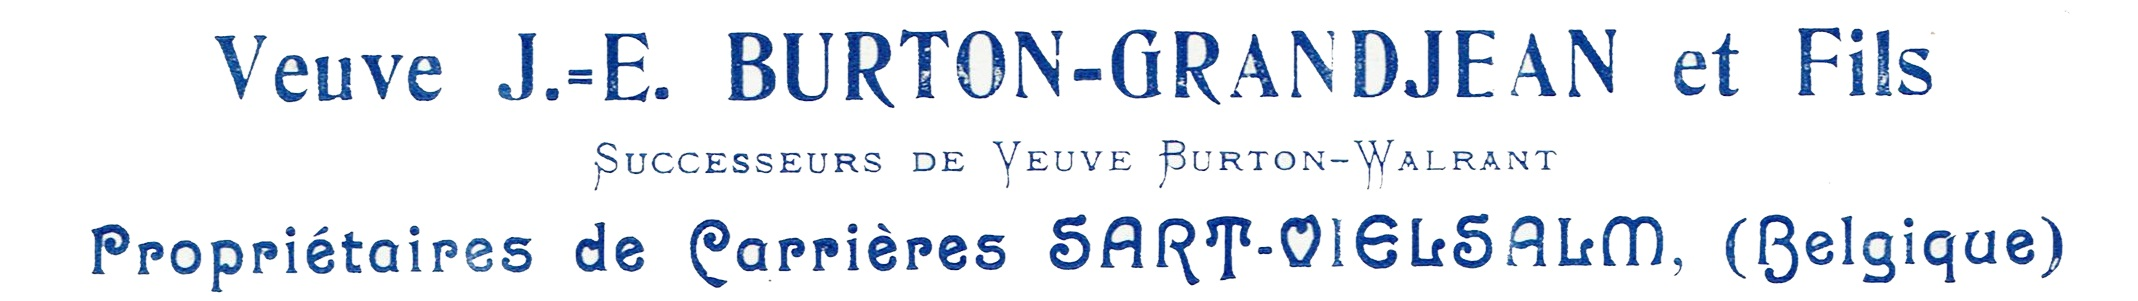 Veuve J.E. Burton-Grandjean et Fils.jpg